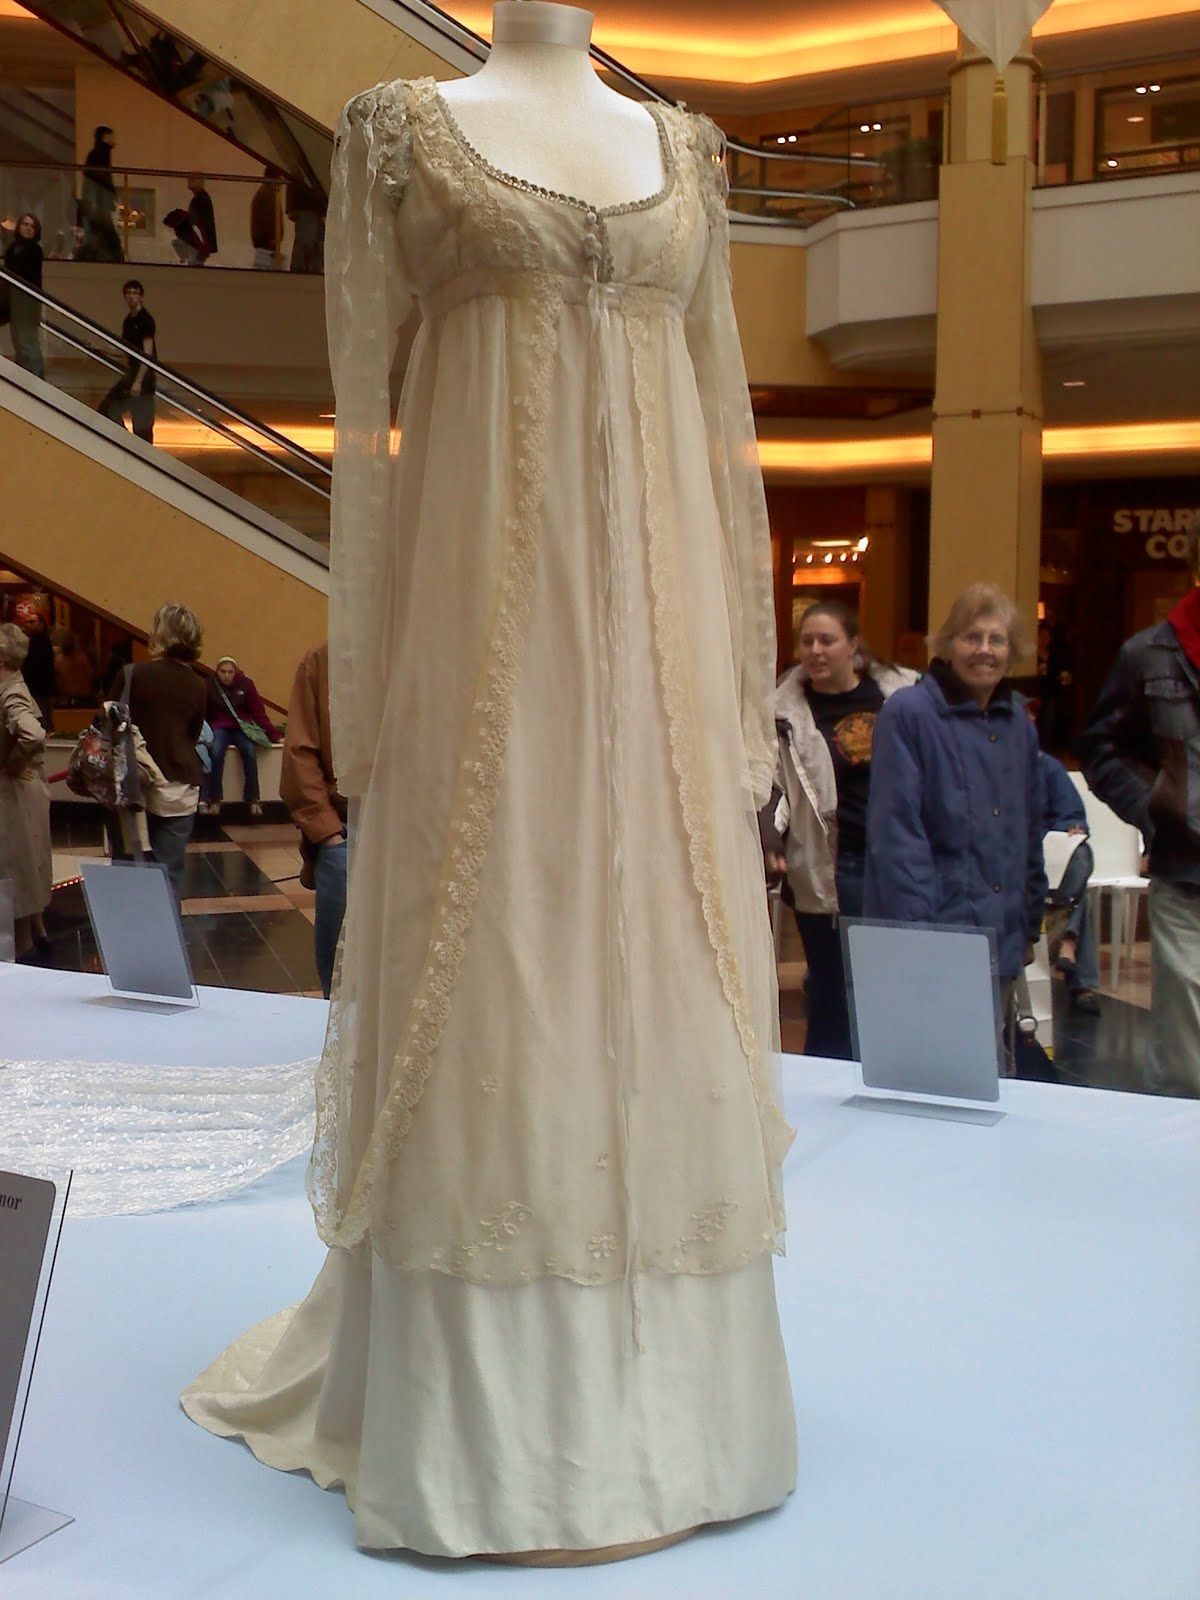 White gold wedding dress  Perdy   vestidos de noche  Pinterest  Wedding dress Gowns and